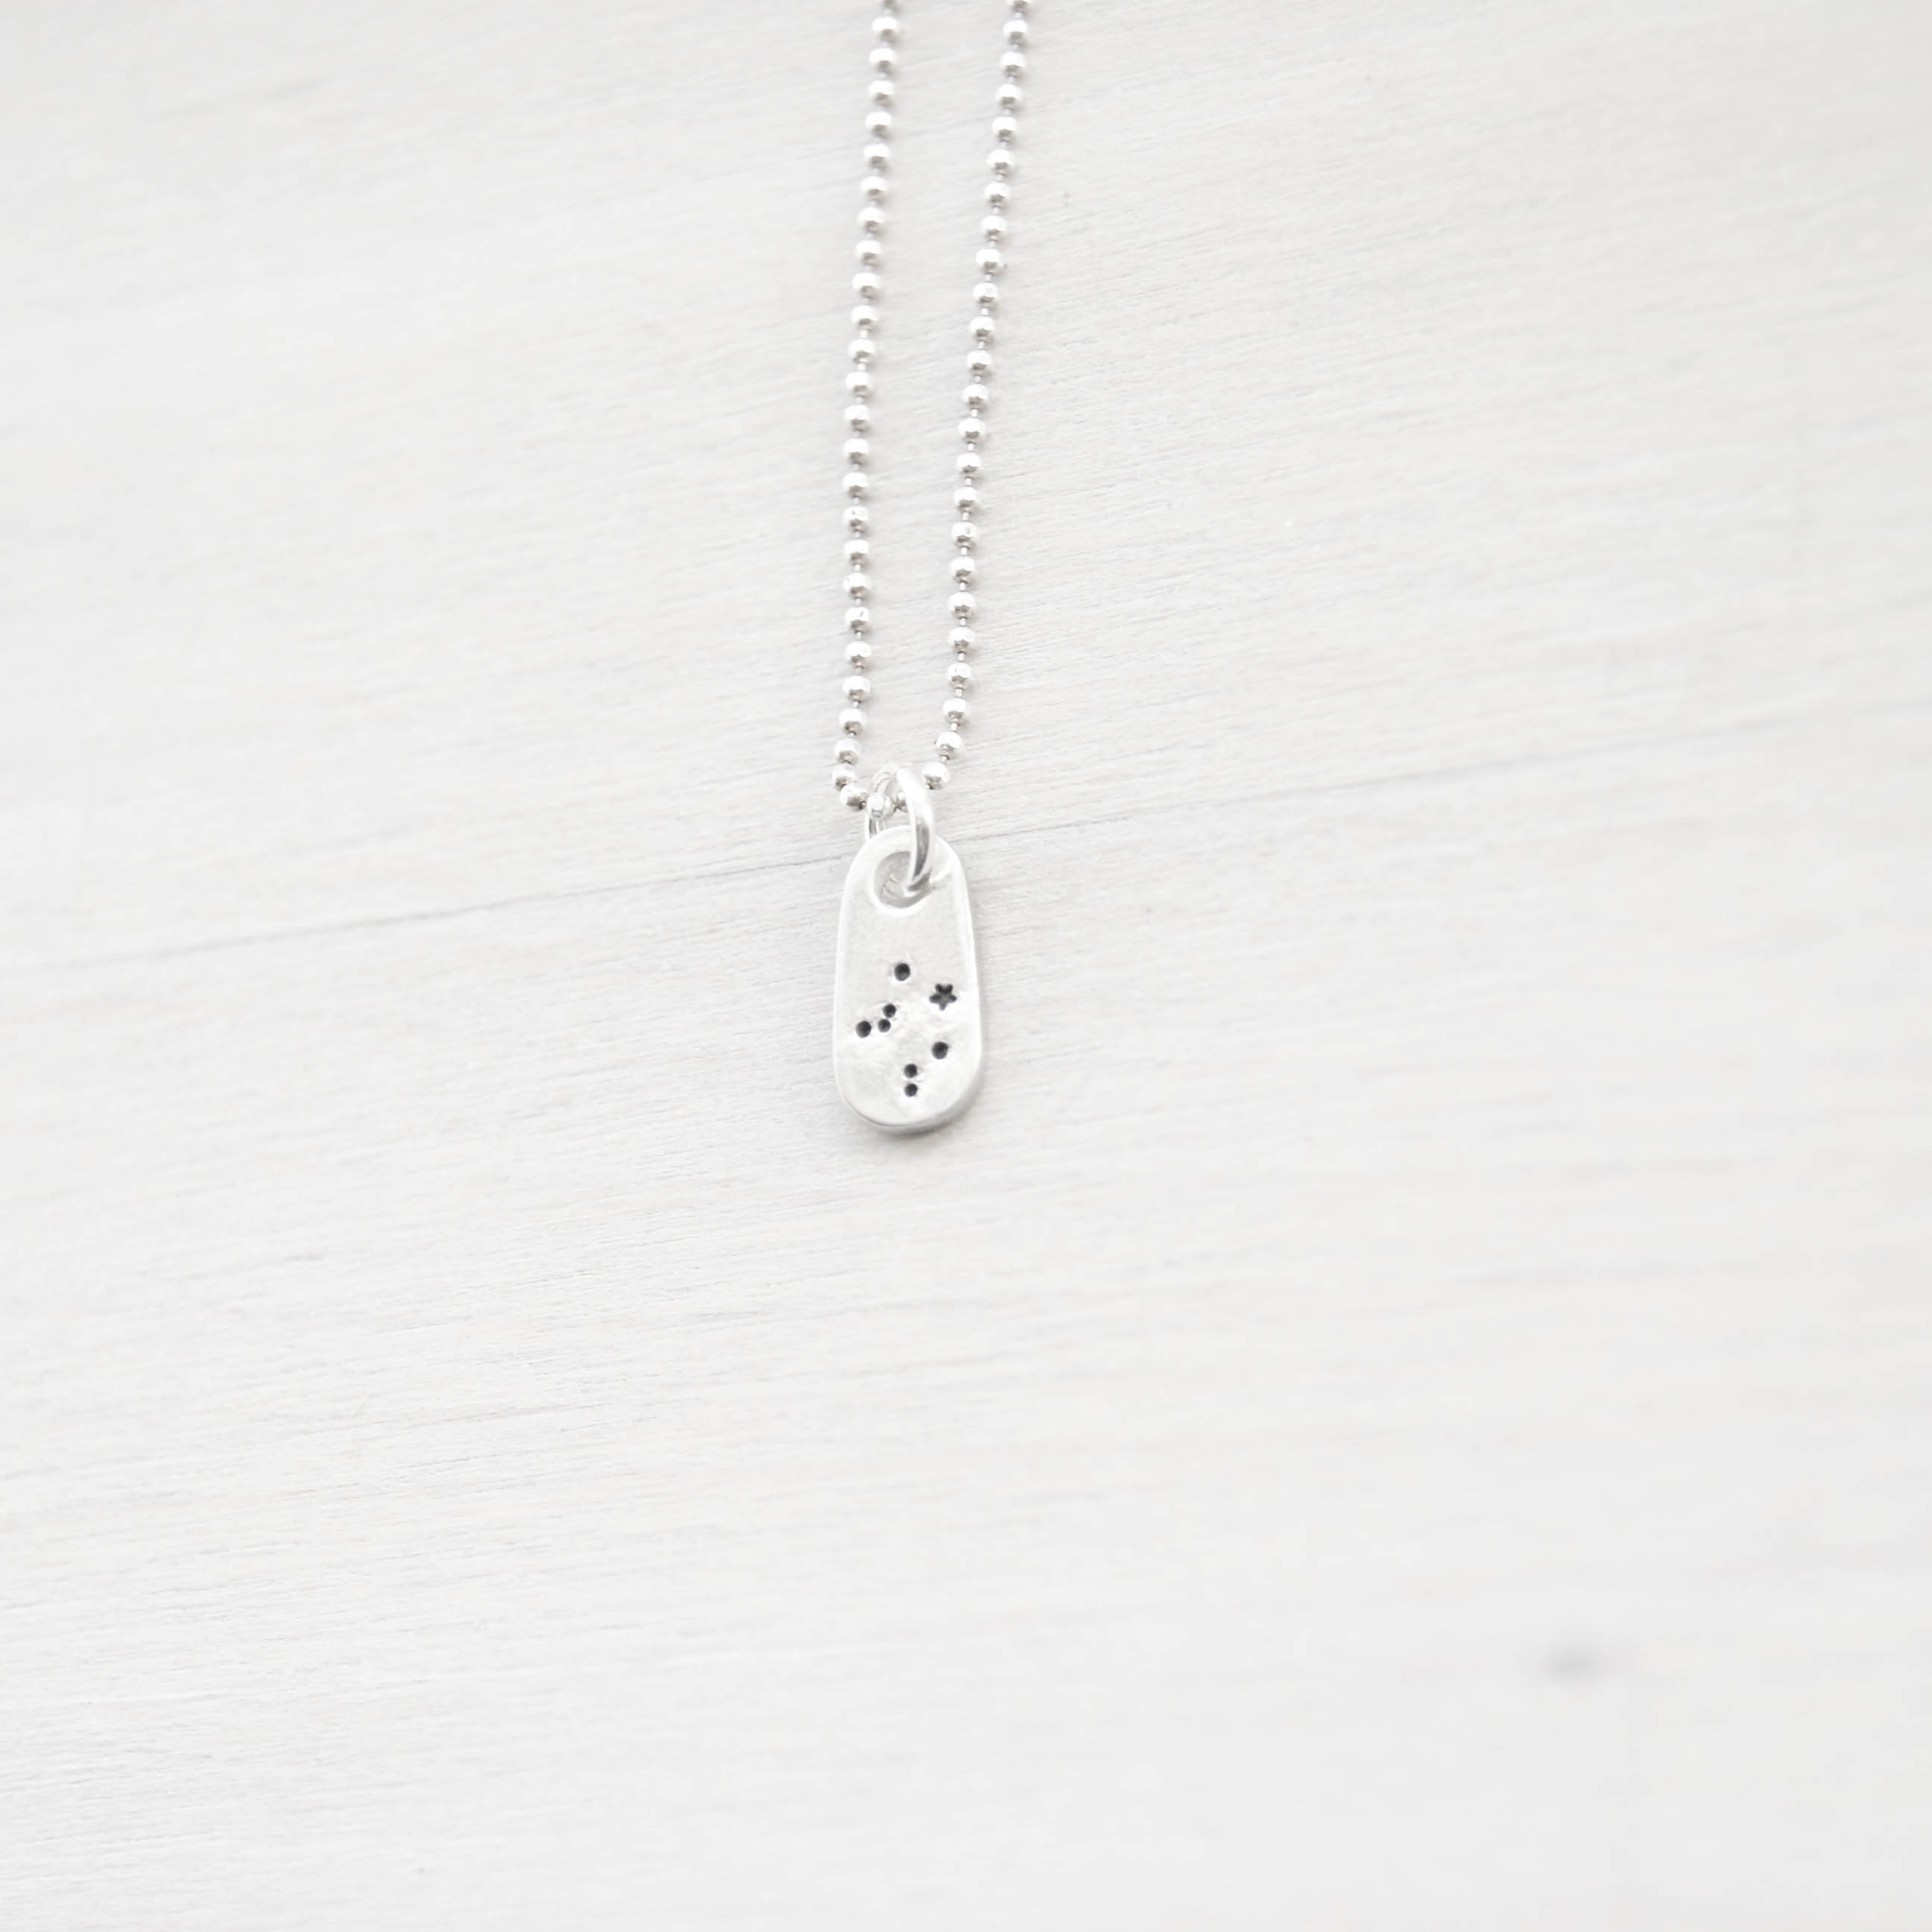 Libra Constellation Zodiac Necklace in Artisan Pewter